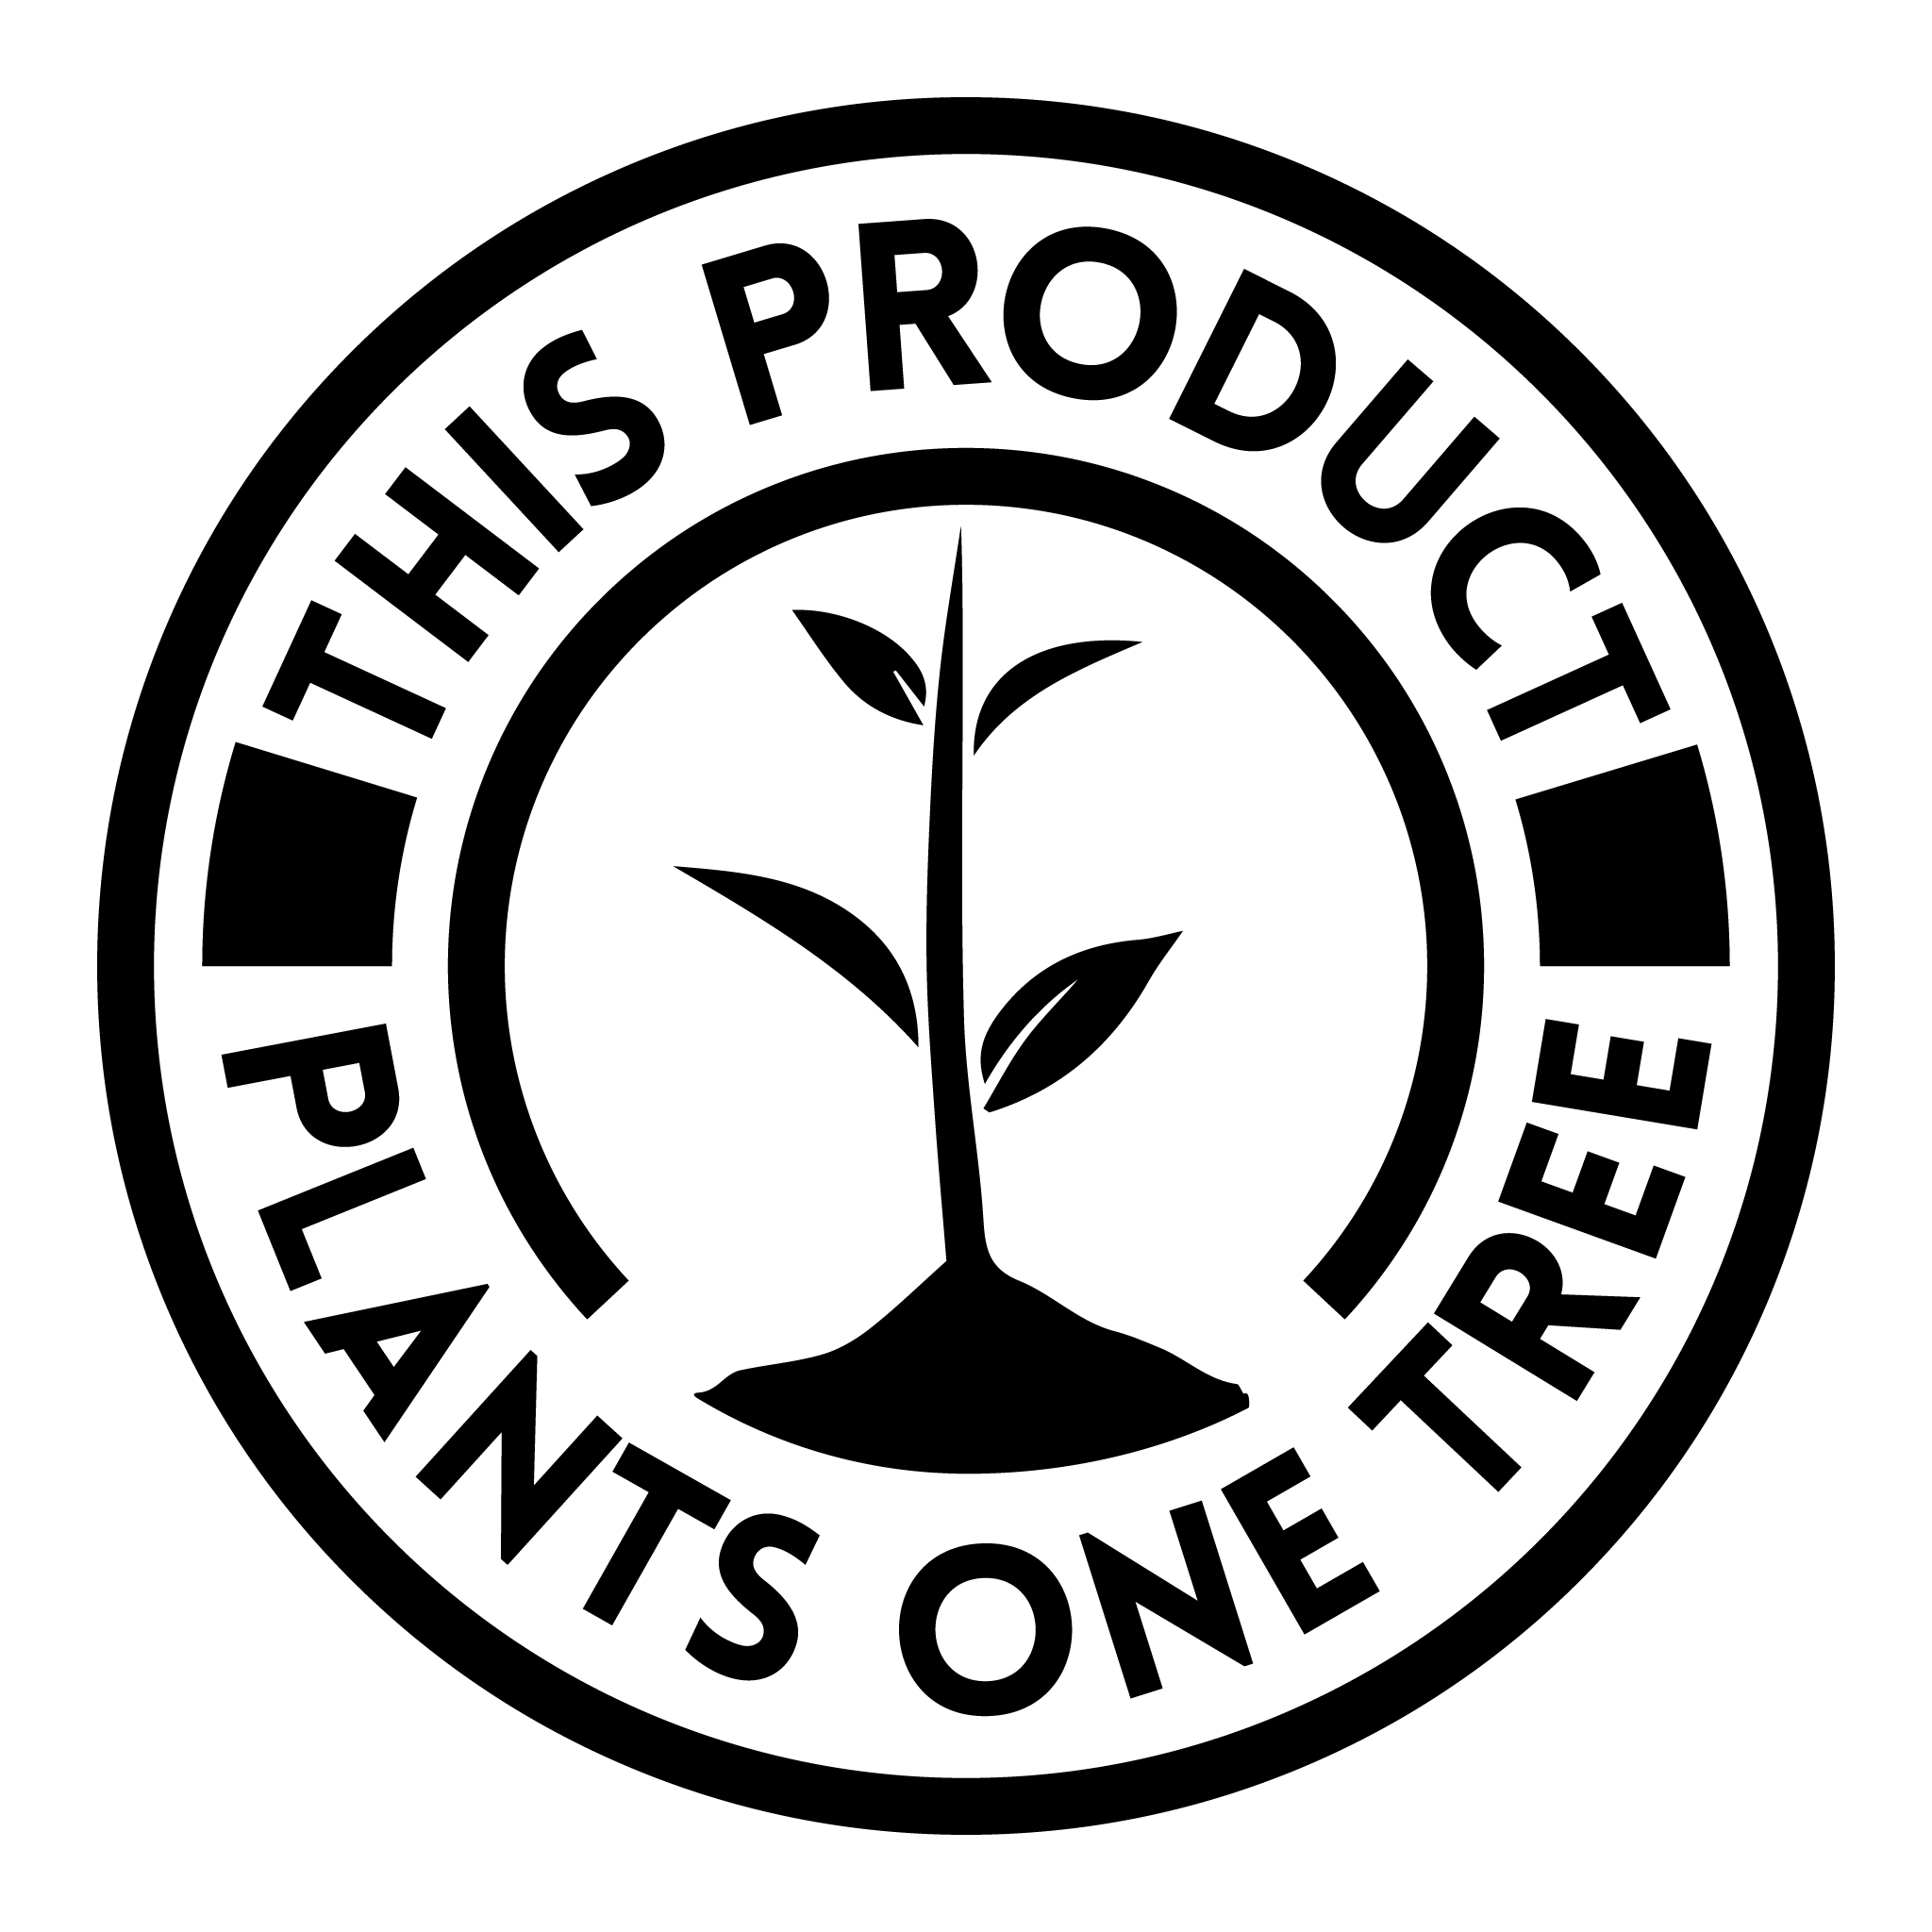 paperlust logo